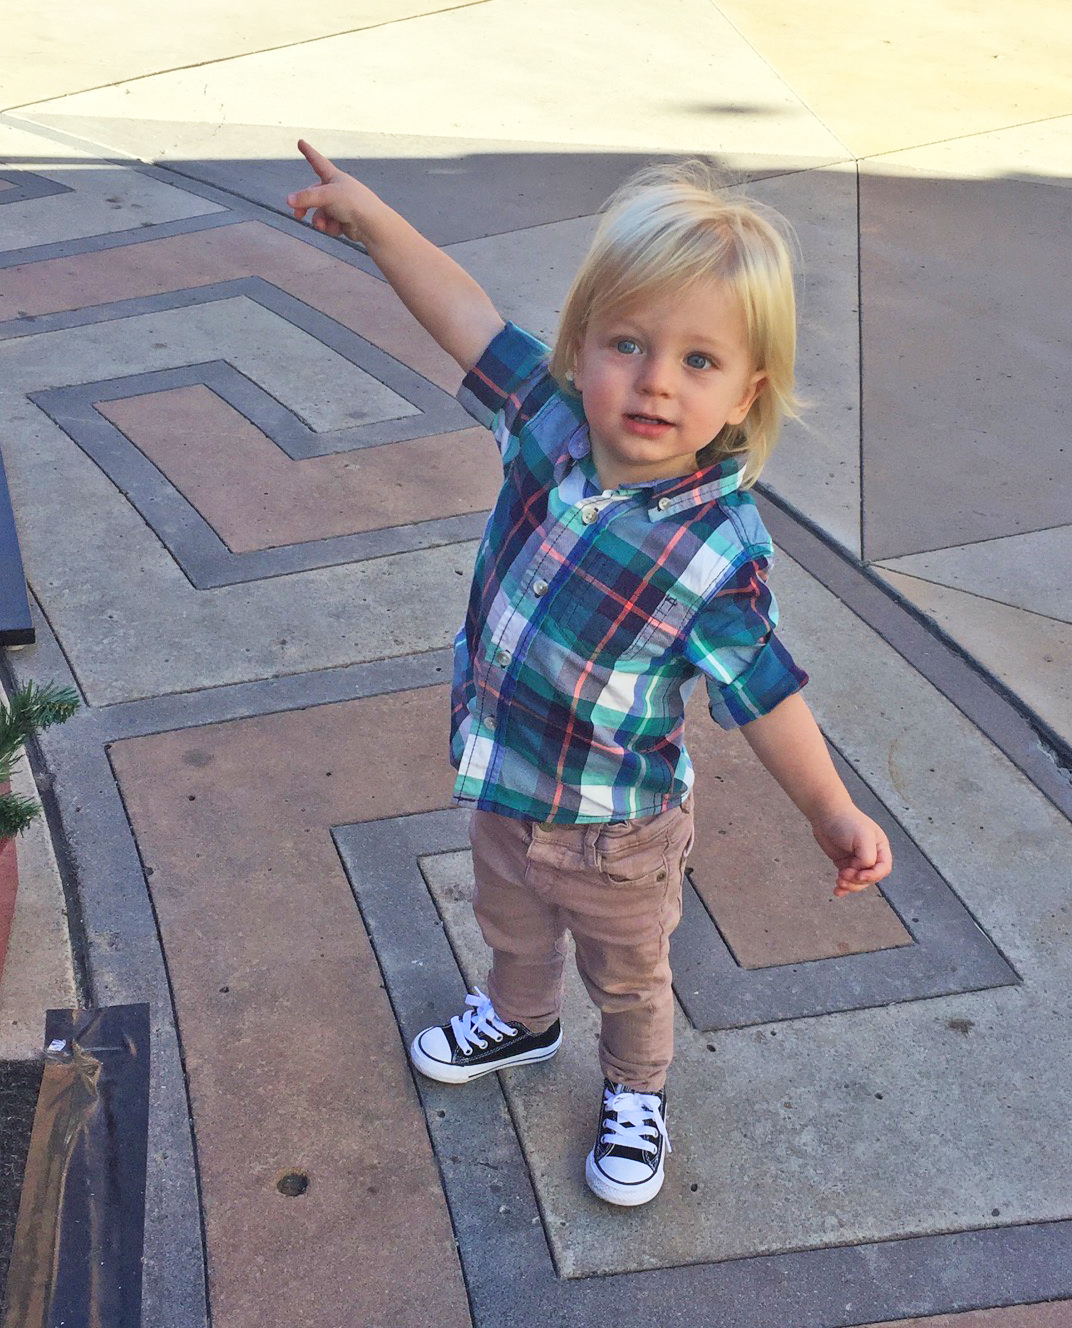 My grandson Dylan